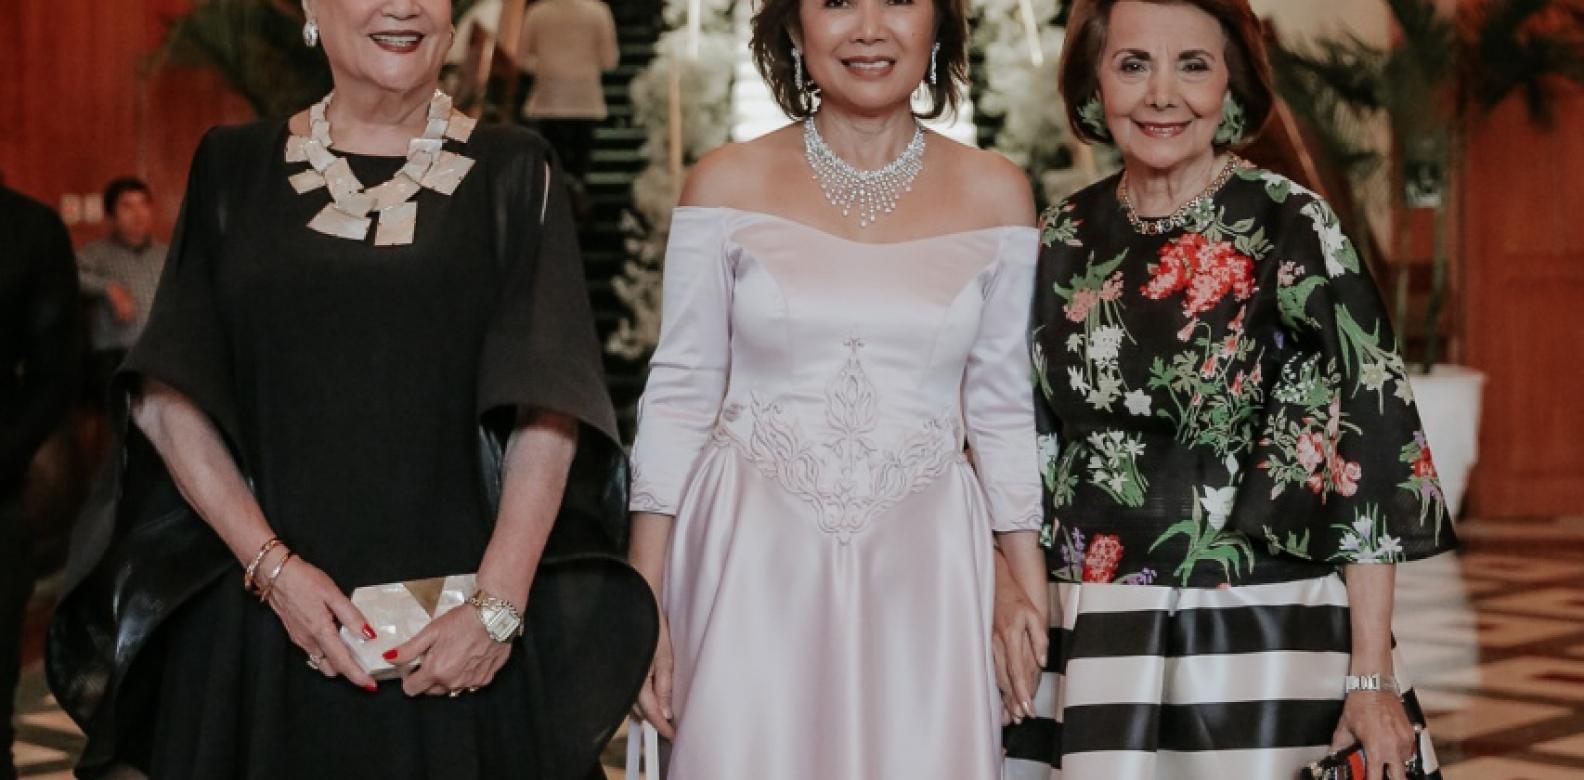 Mila Wales, Mariquita Yeung and Teresin Mendezona